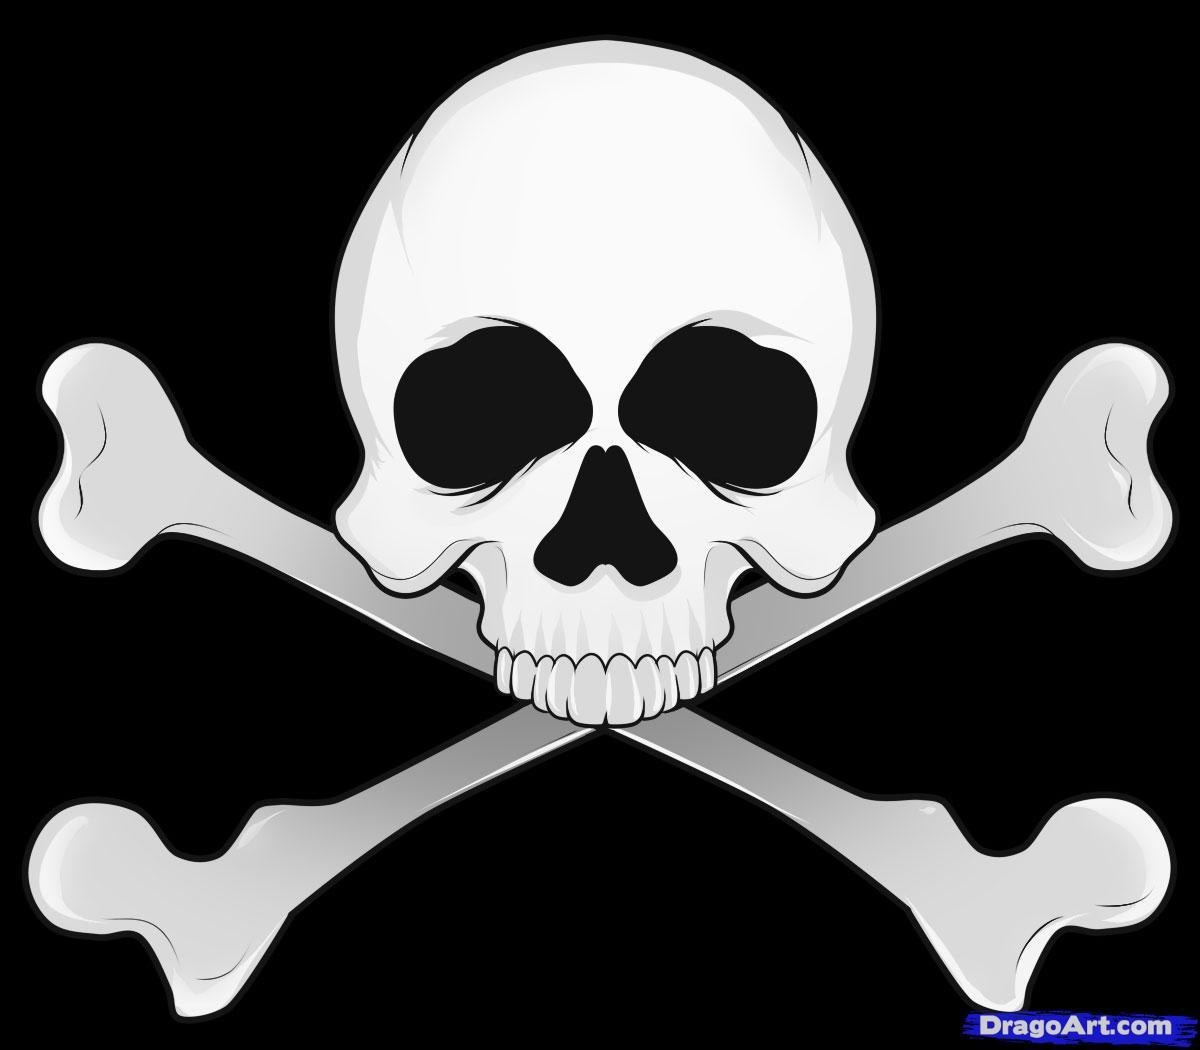 Drawn sleleton head bone To draw FREE to Skulls